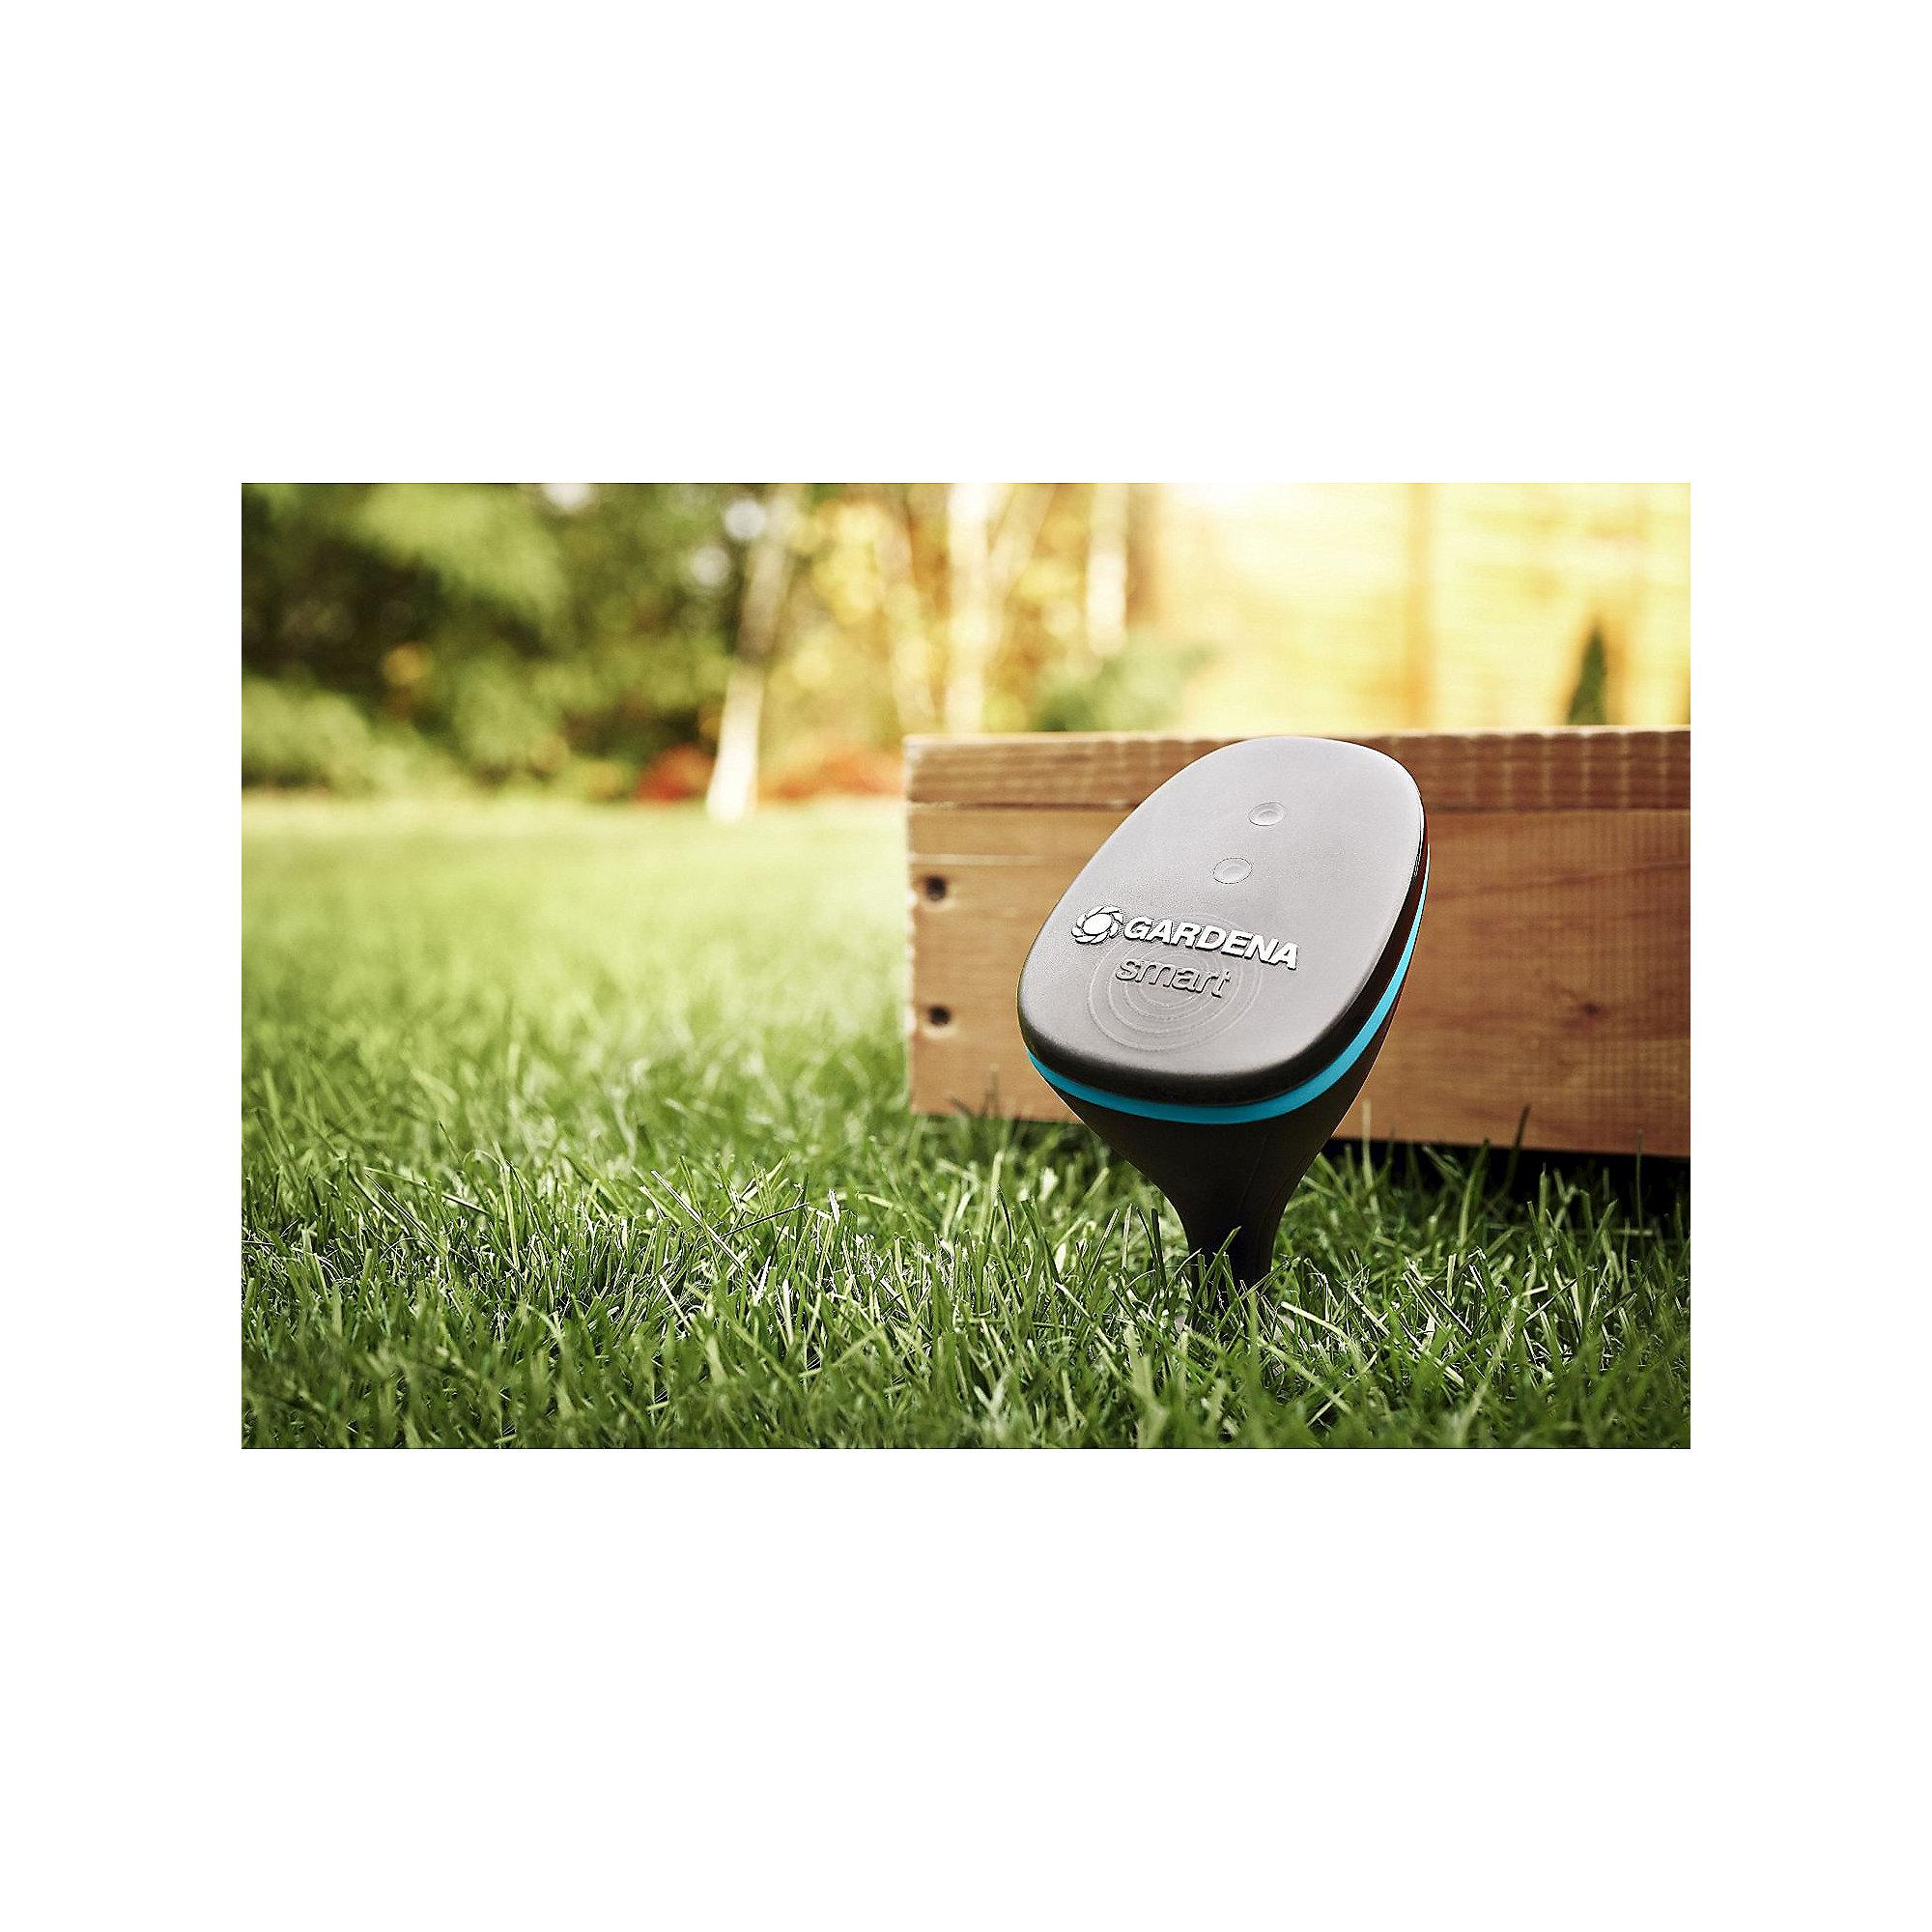 gardena 19030 20 smart sensor cyberport. Black Bedroom Furniture Sets. Home Design Ideas